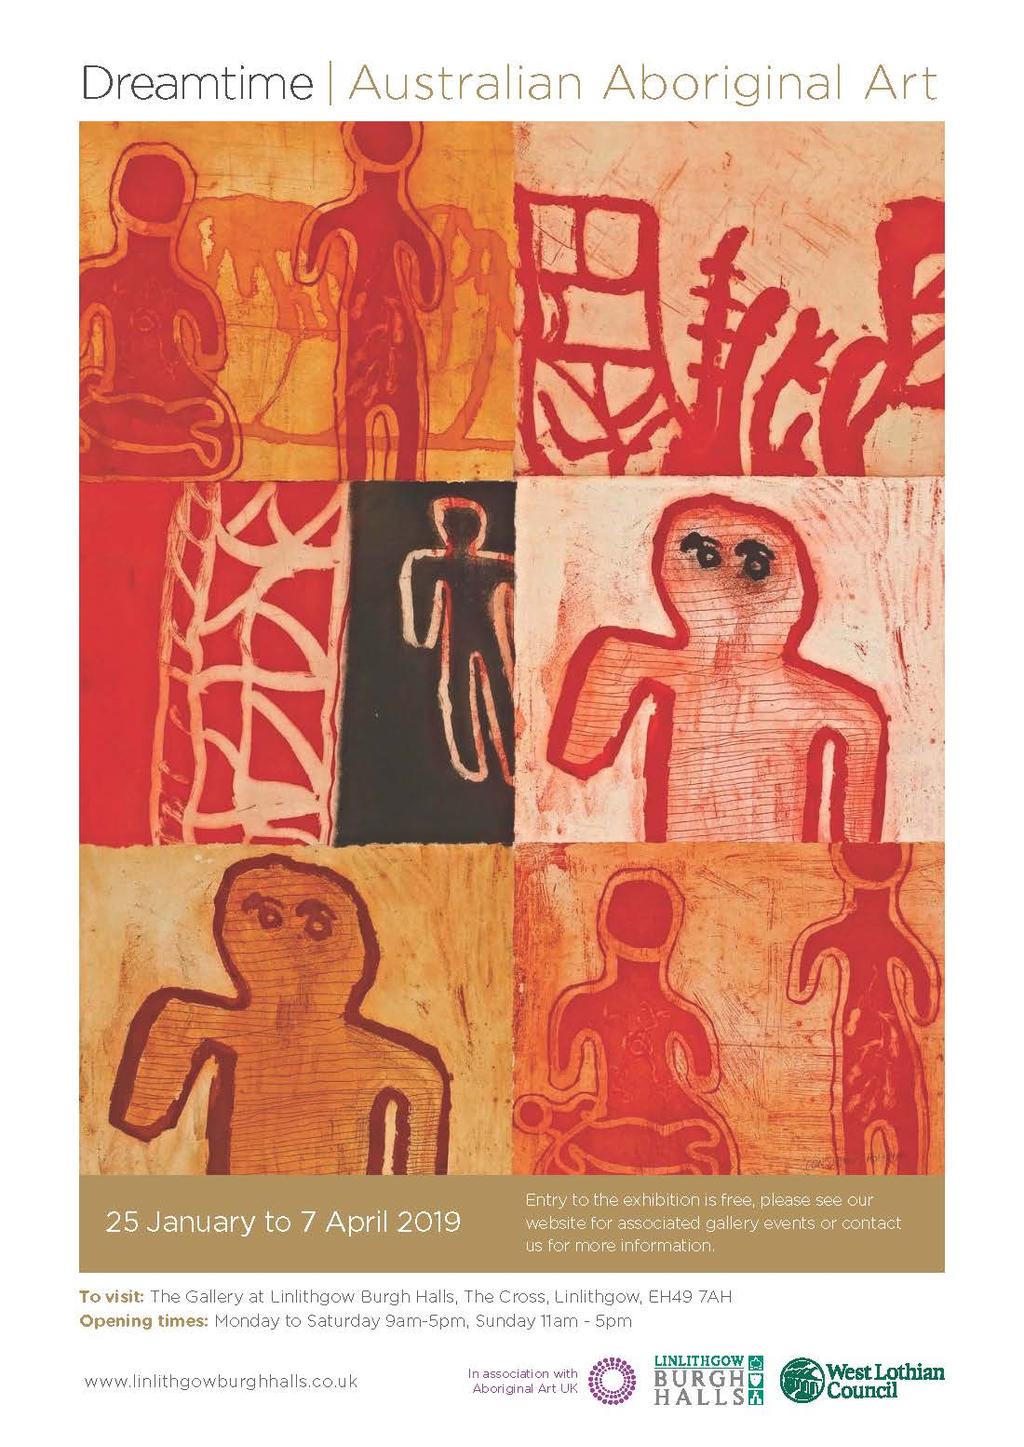 New Exhibition Dreamtime Australian Aboriginal Art